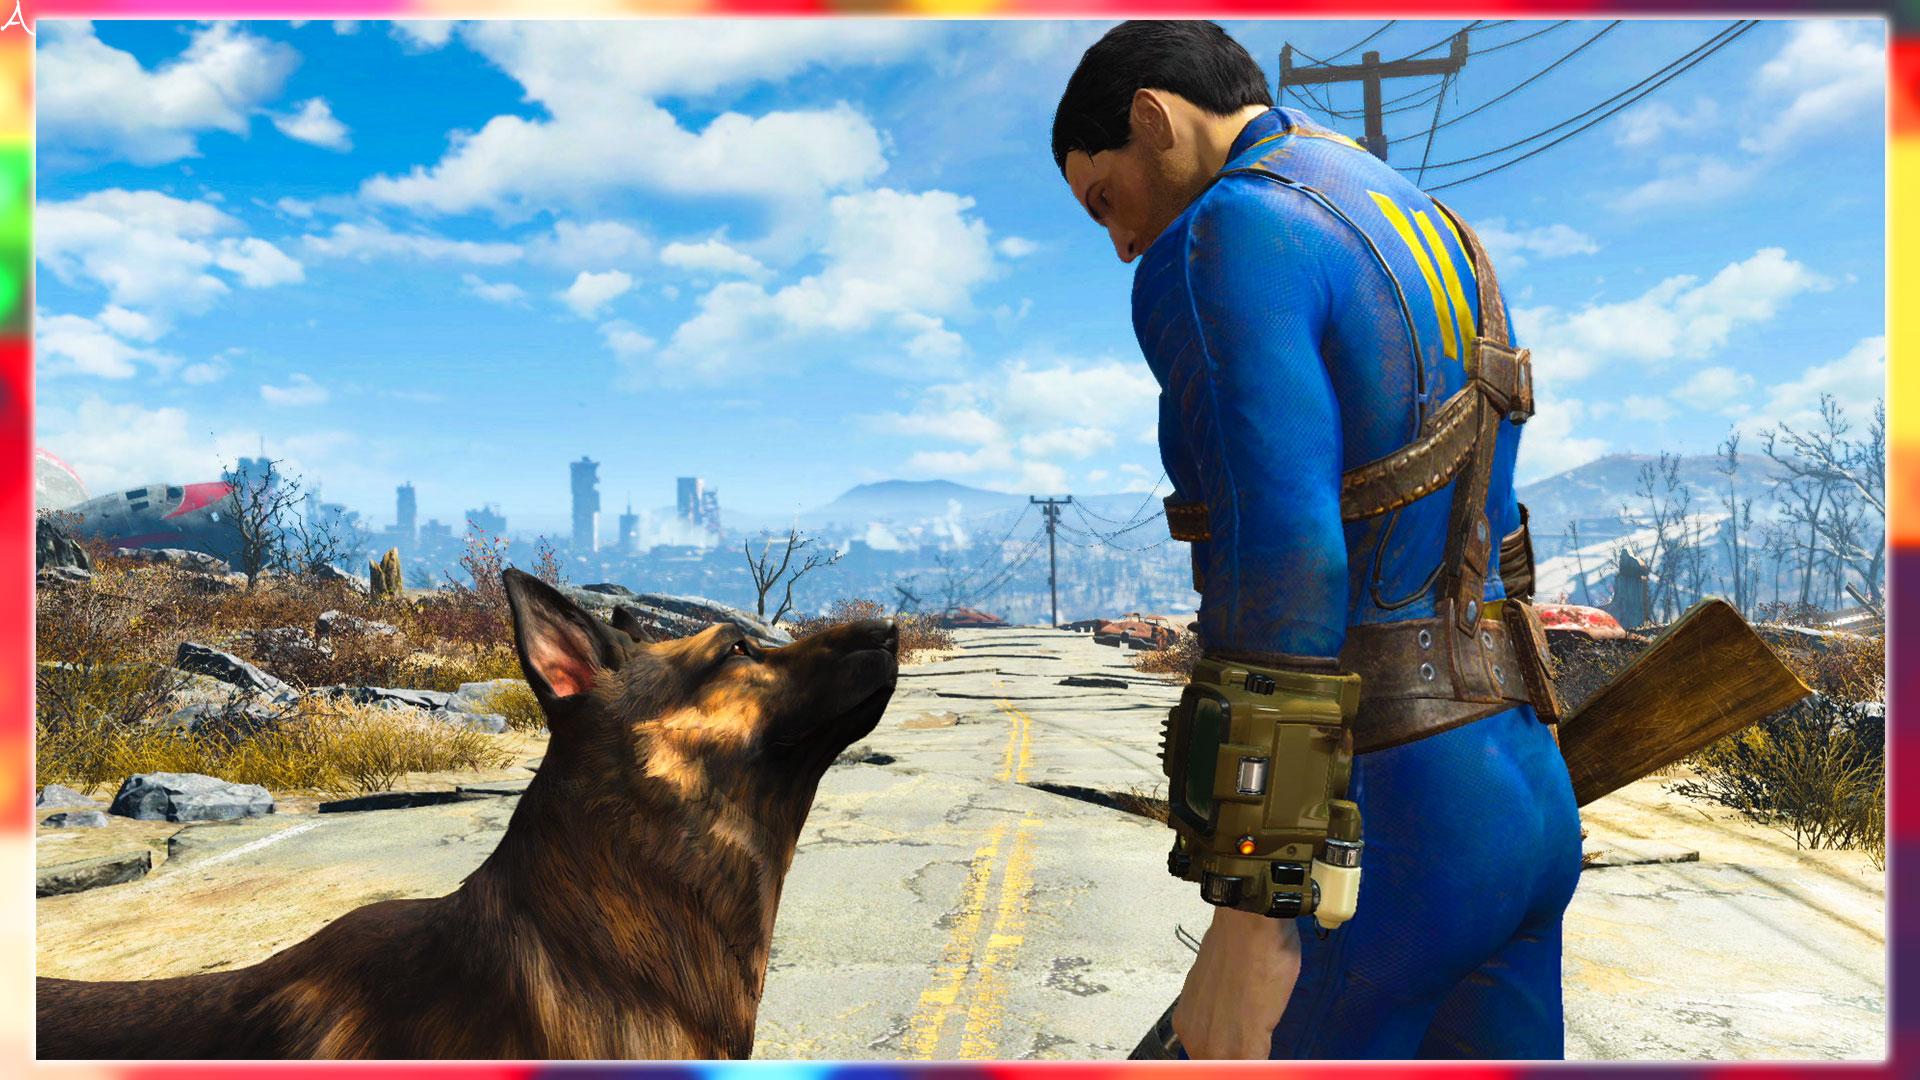 PC版「Fallout 4」(フォールアウト4)に必要な最低/推奨スペックを確認